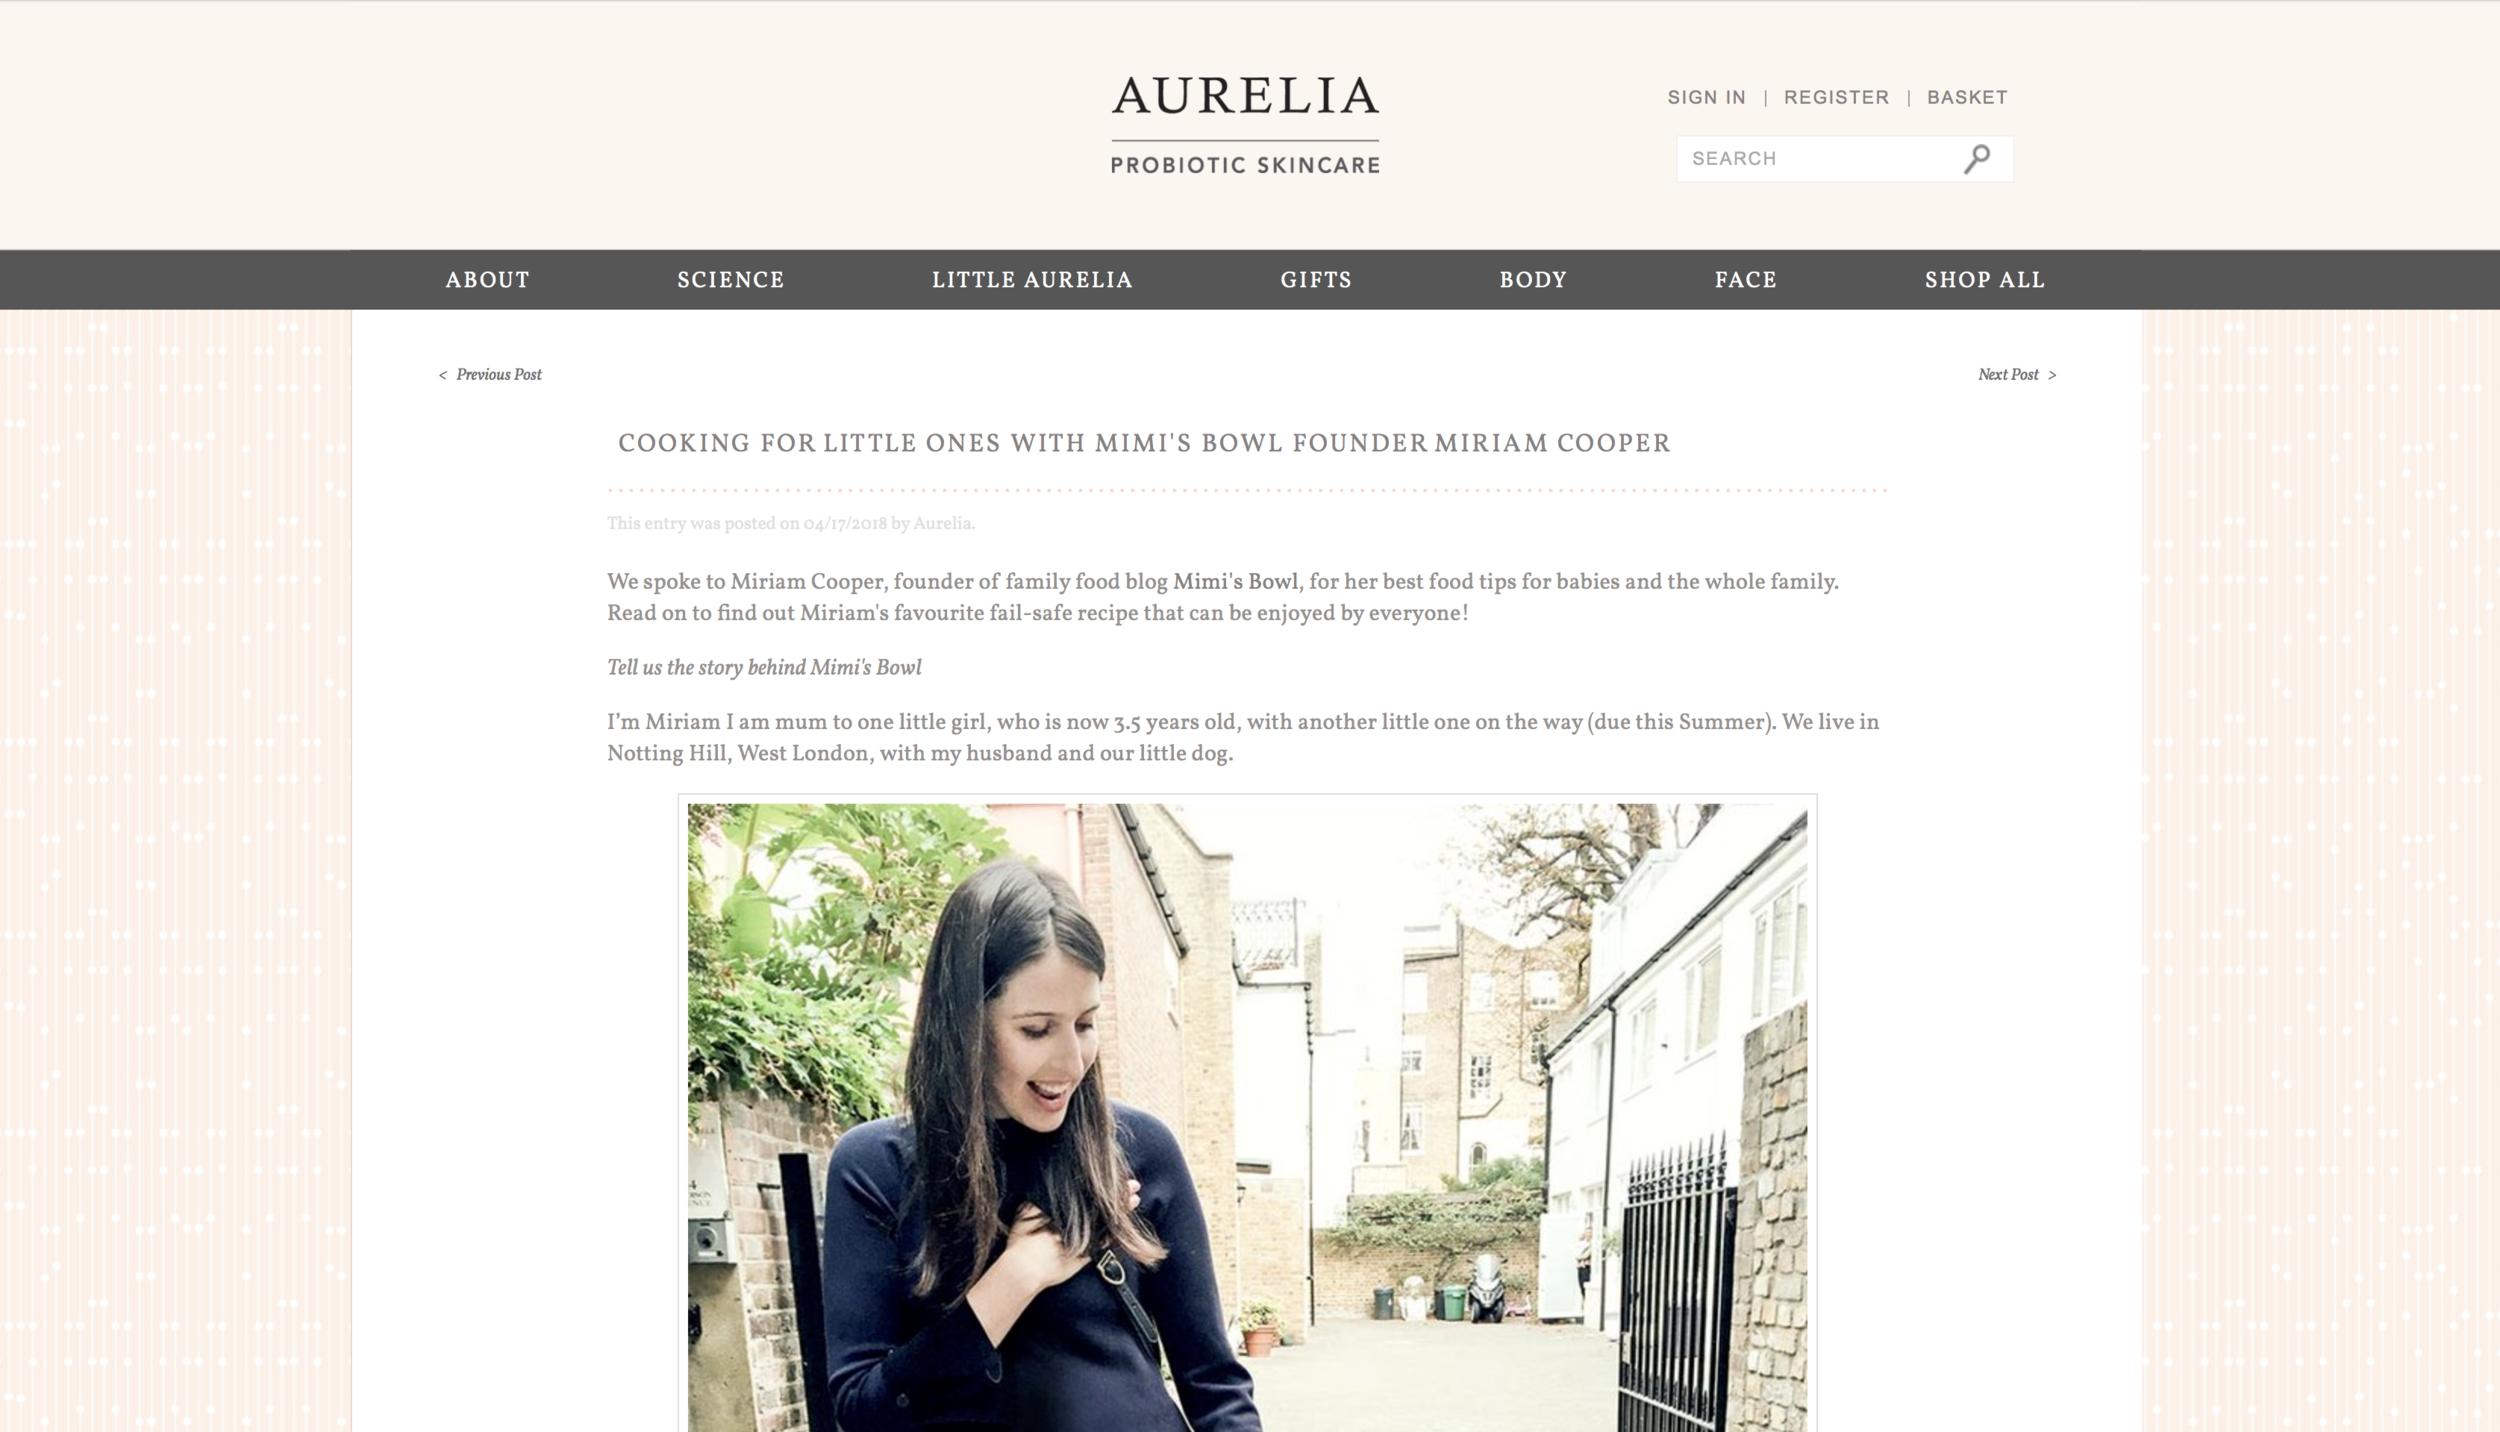 Little Aurelia 26.04.18 2 of 7.png